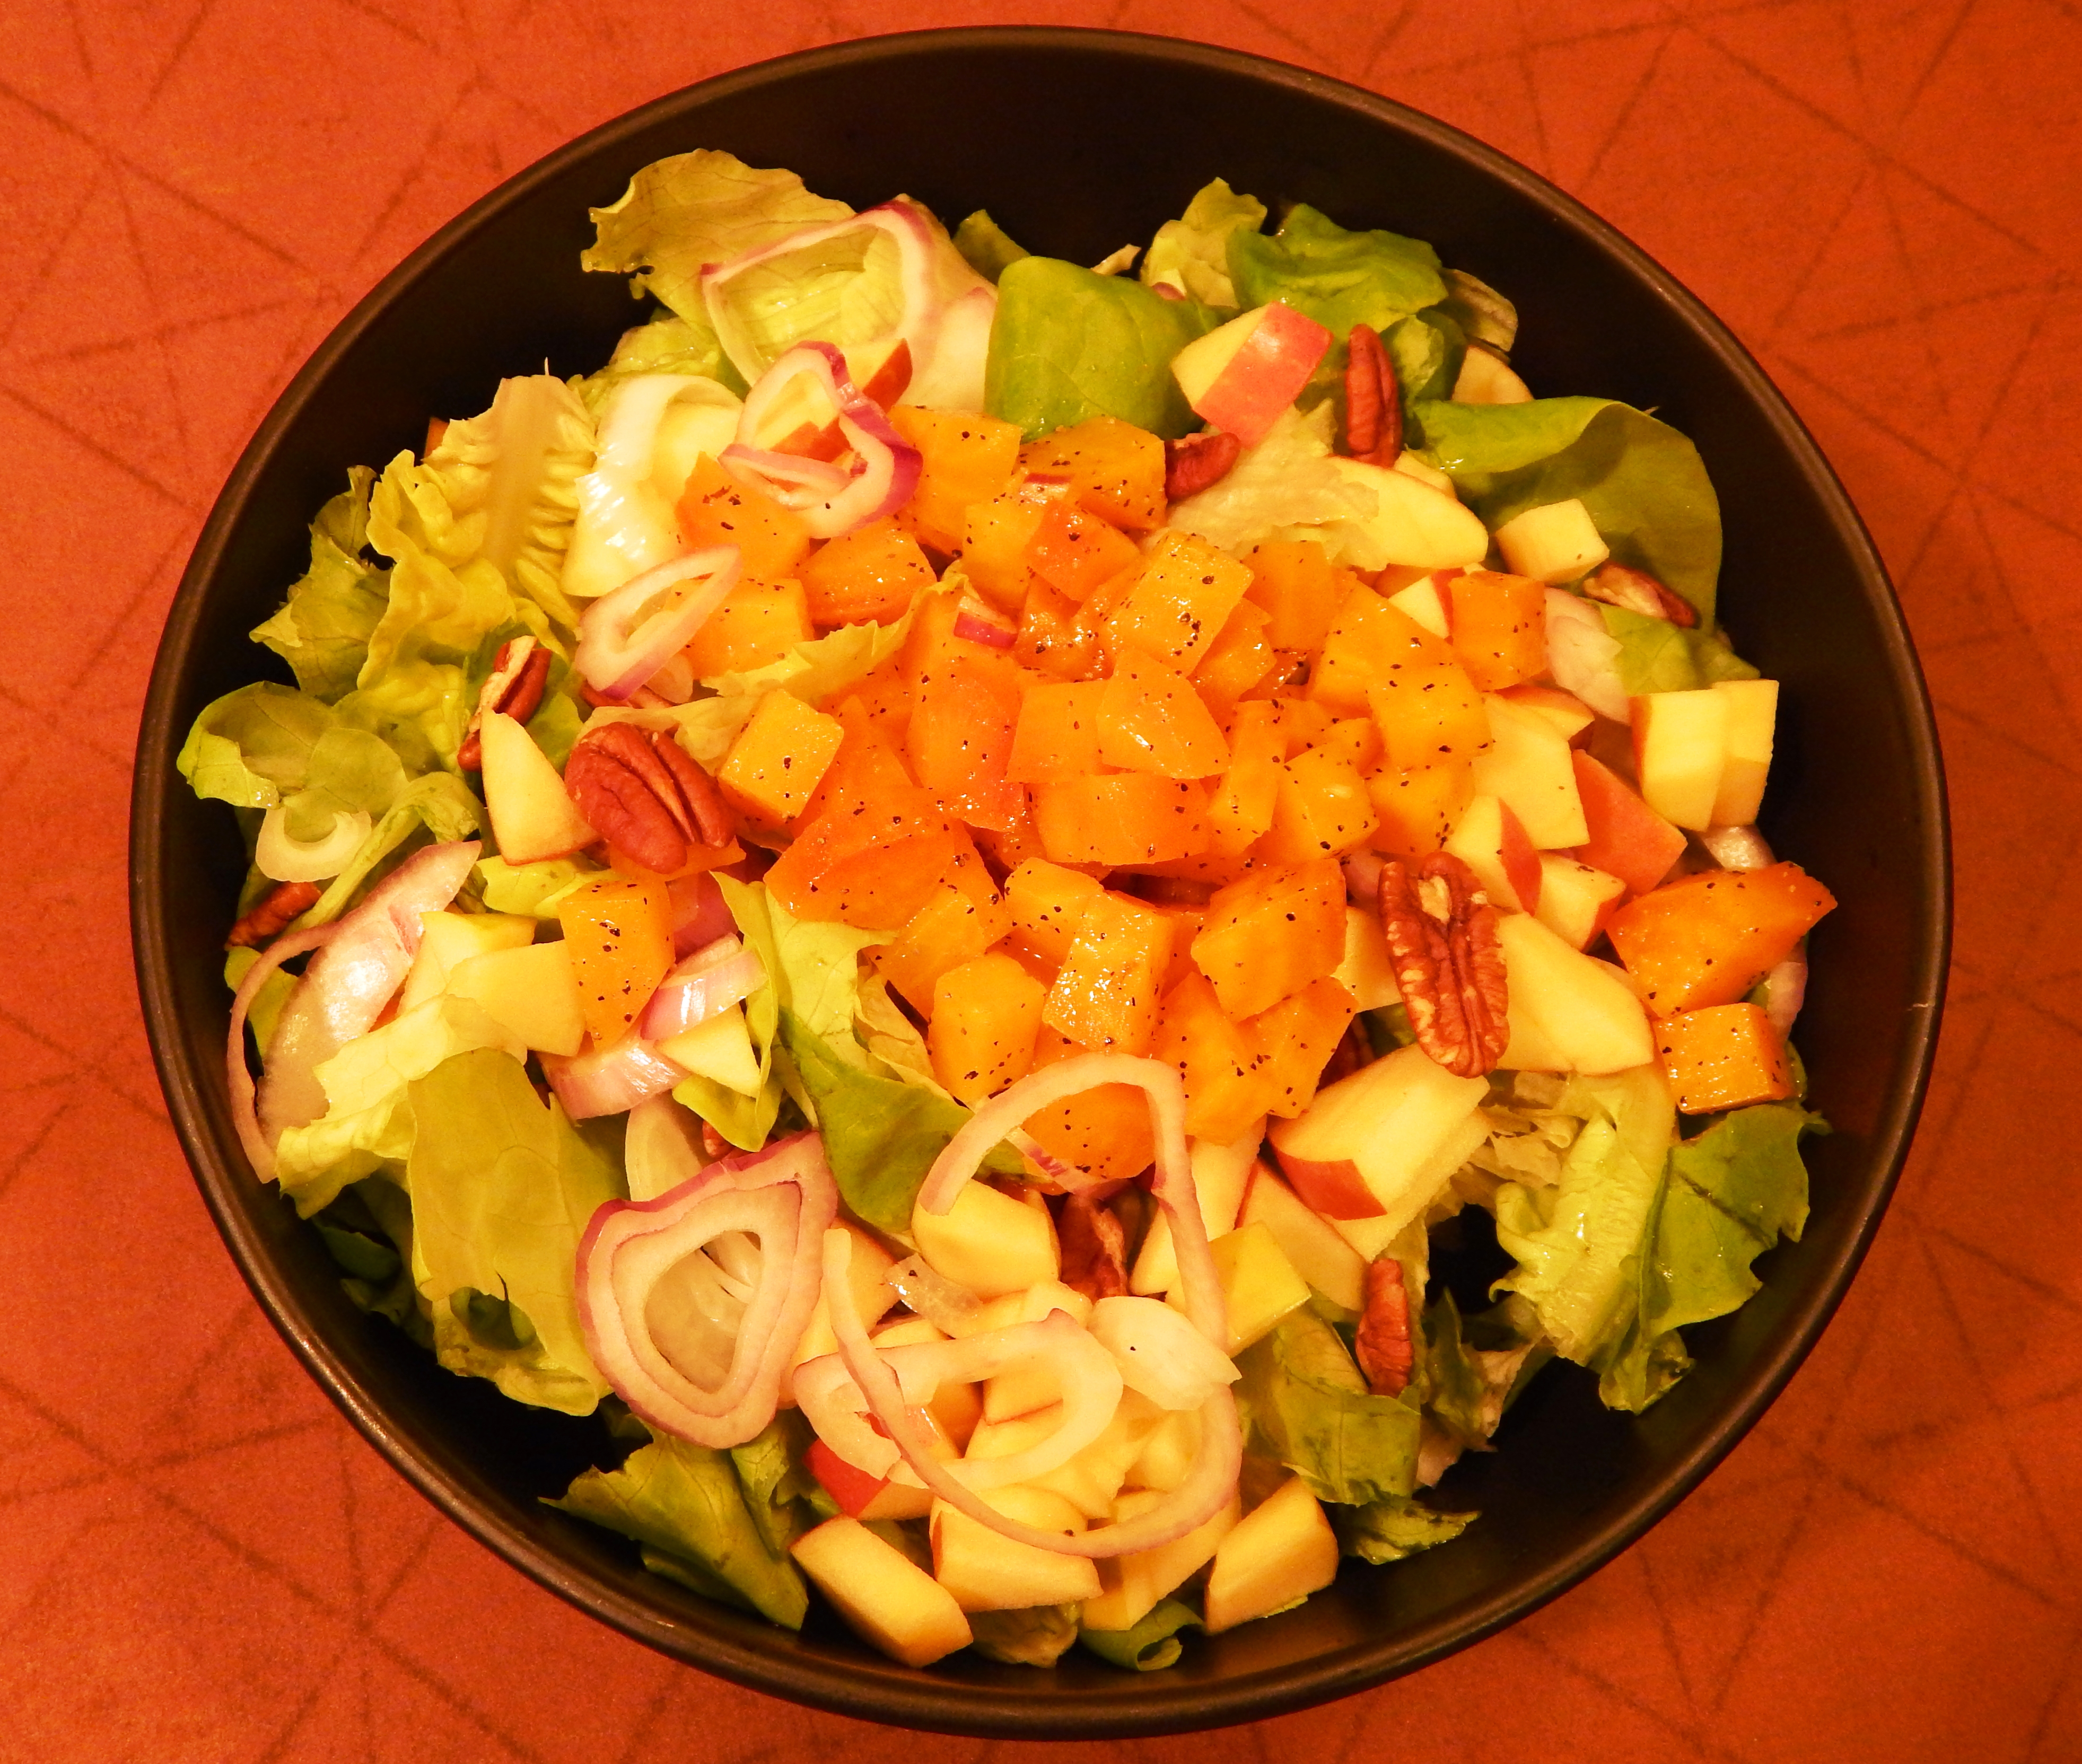 Fuji Apple Pecan Beet Salad with White Balsamic Vinagrette Bowl